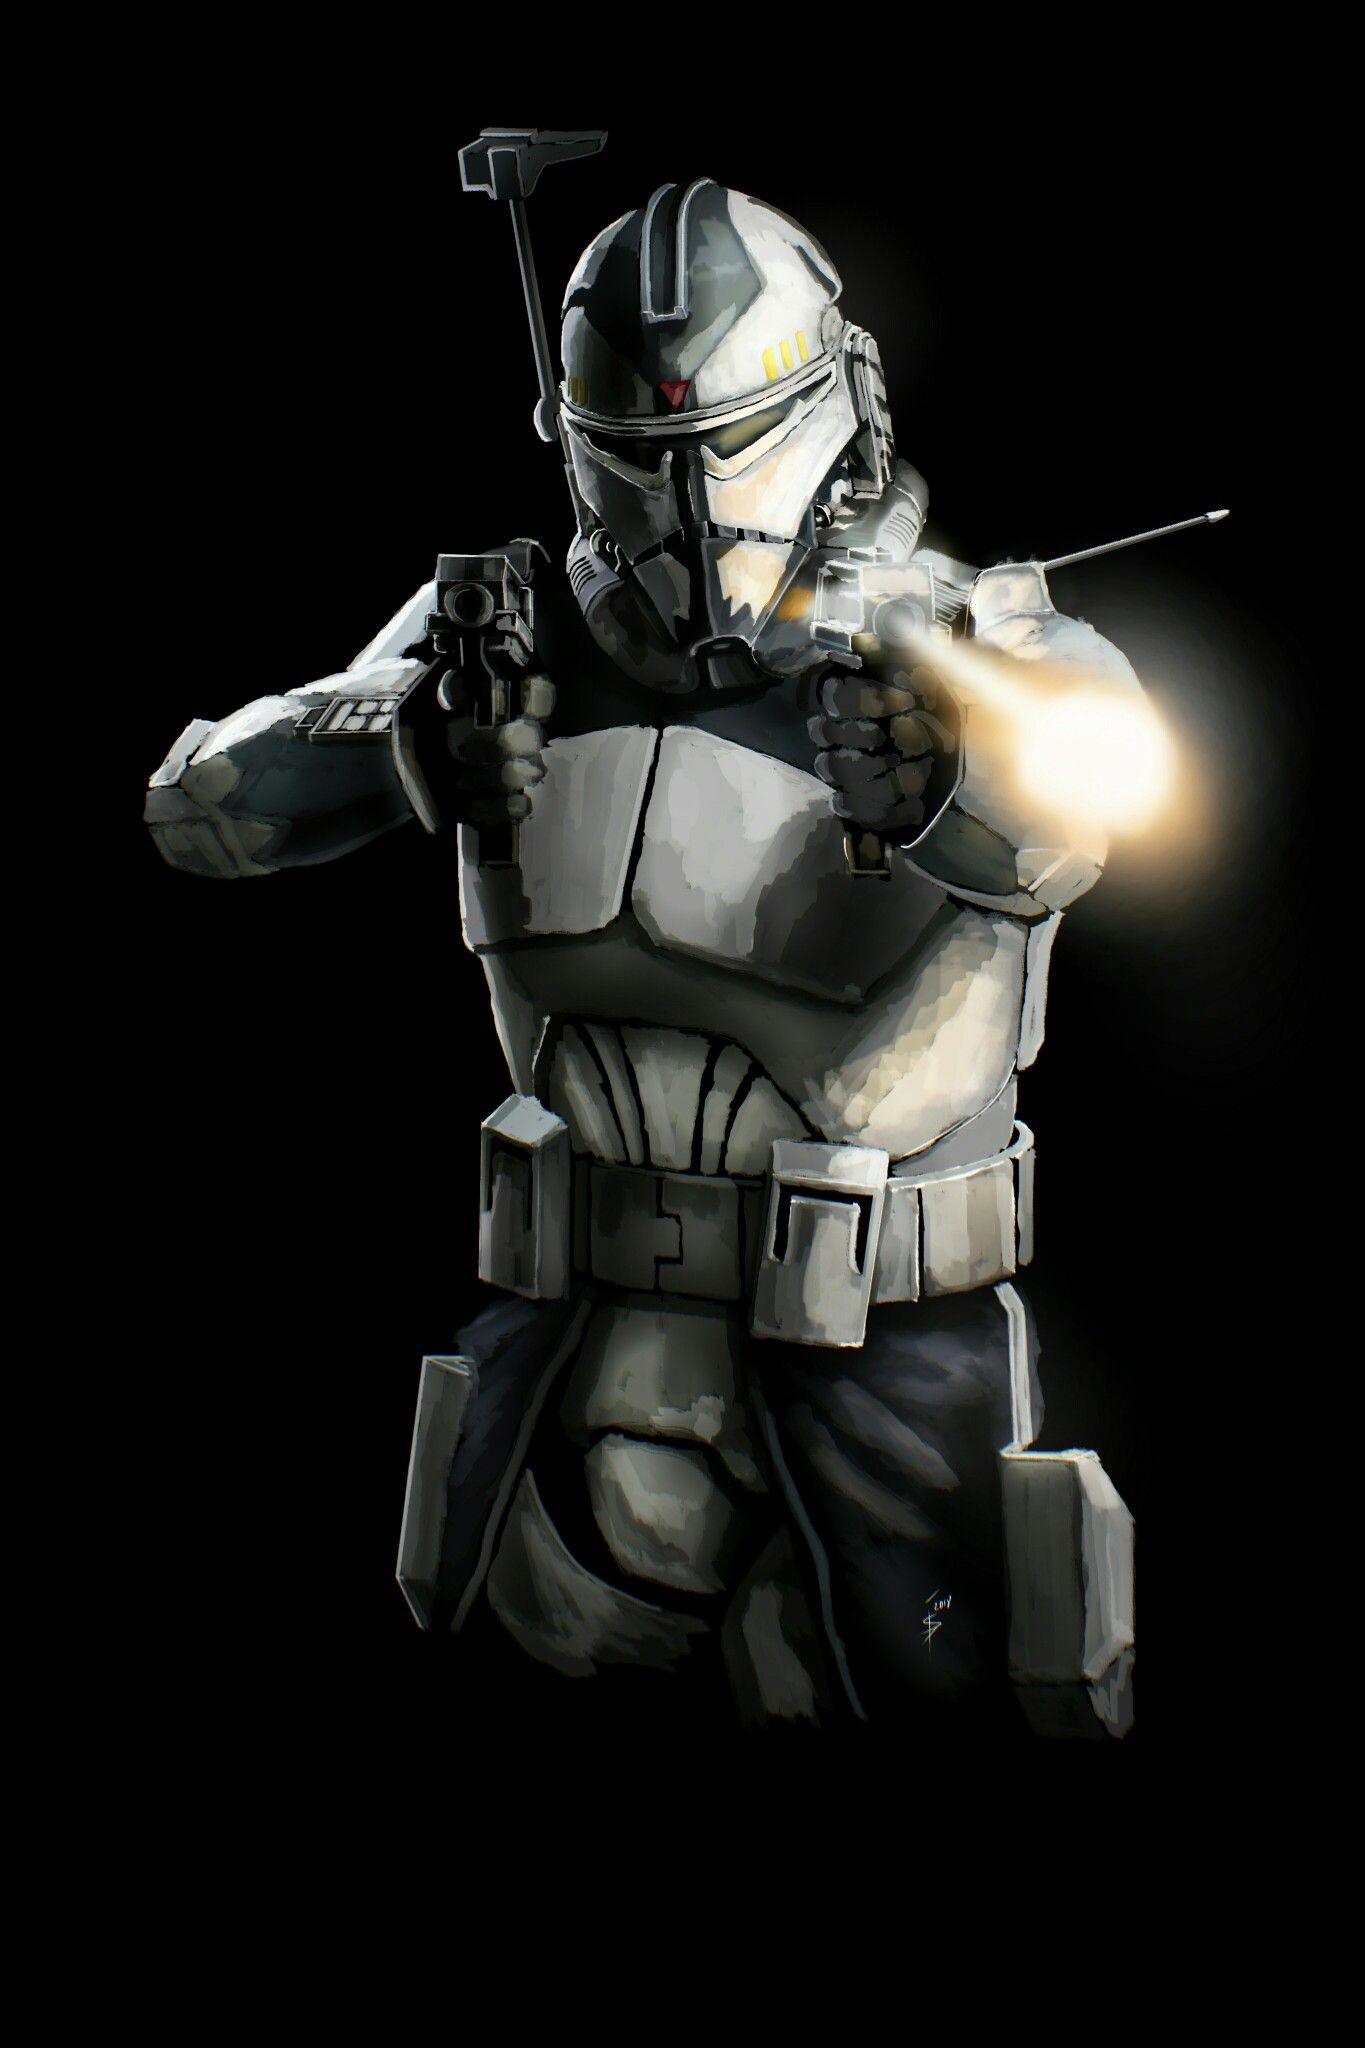 Commander Wolffe Action Star Wars Trooper Star Wars Artwork Star Wars Wallpaper